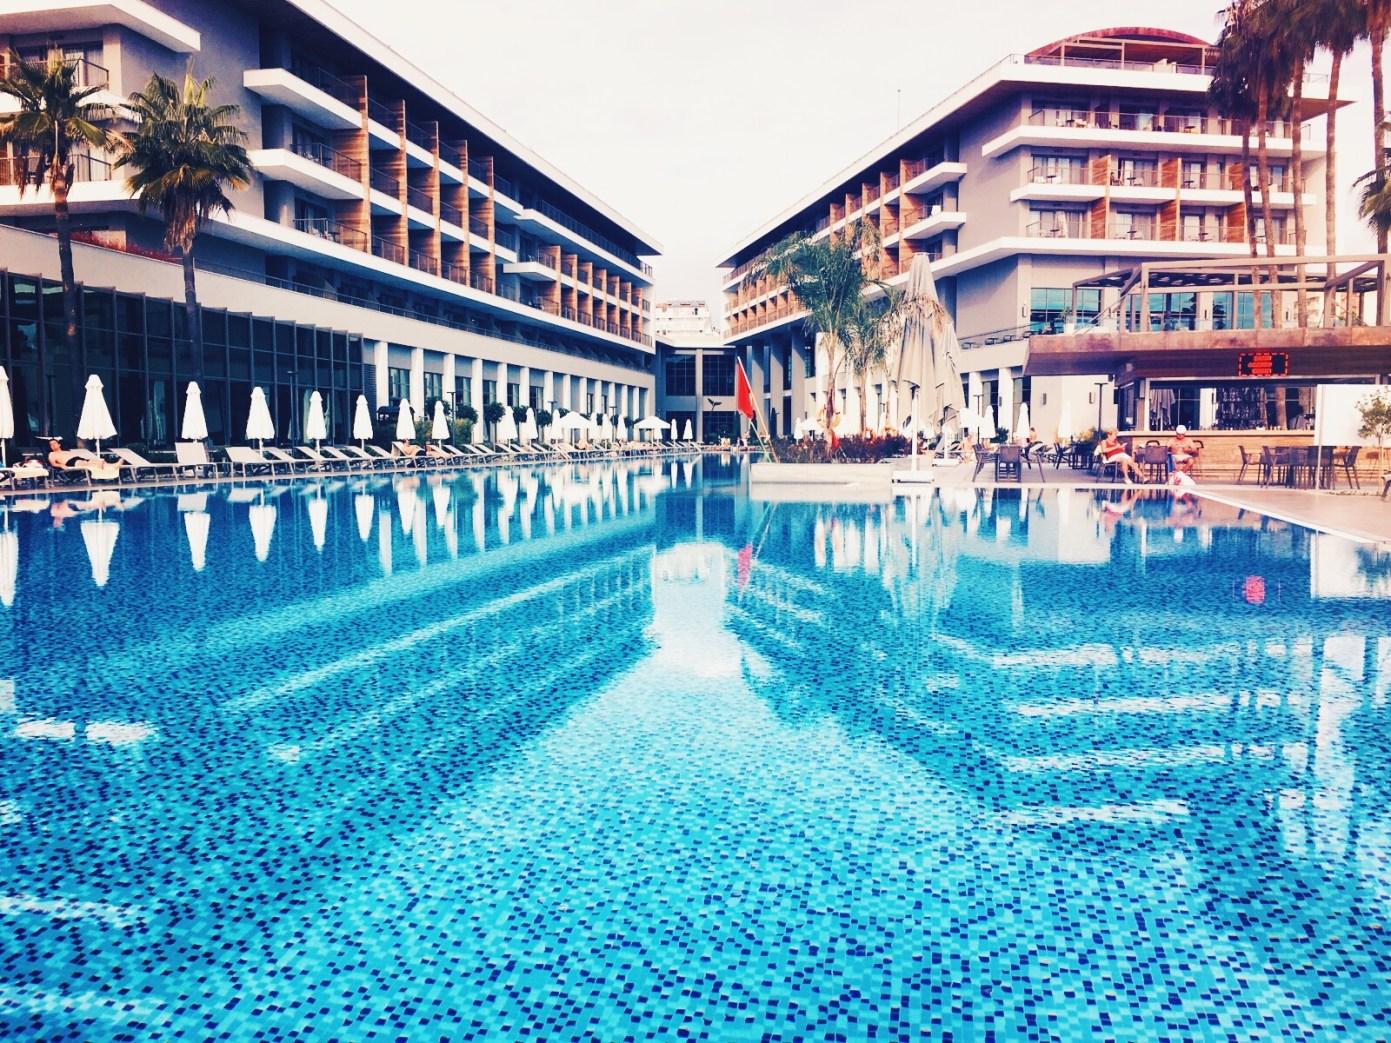 Cooles stylisches Hotel: Barut Acanthus & Cennet © katrin-lars.net